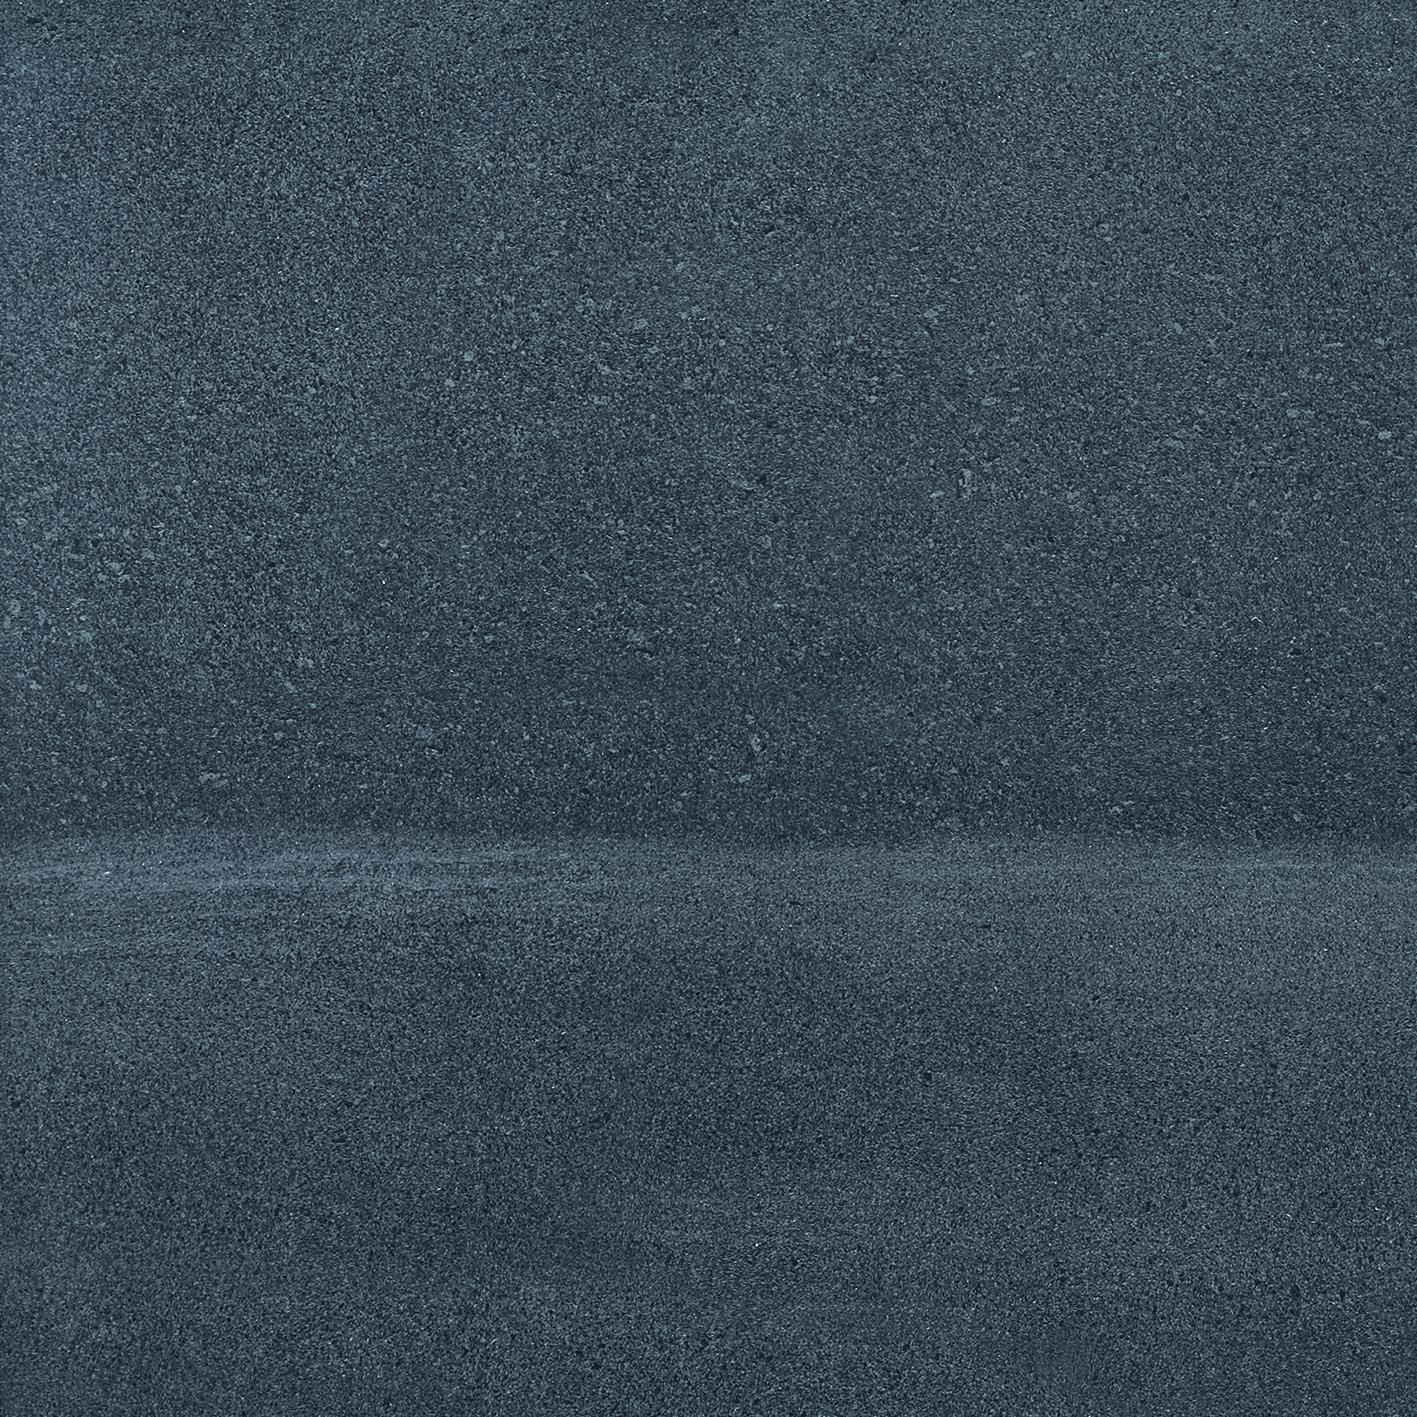 JÄÄK Tecno Stone anthrazit TST235 R10 rect. 60x60 II sort - Hansas Plaadimaailm